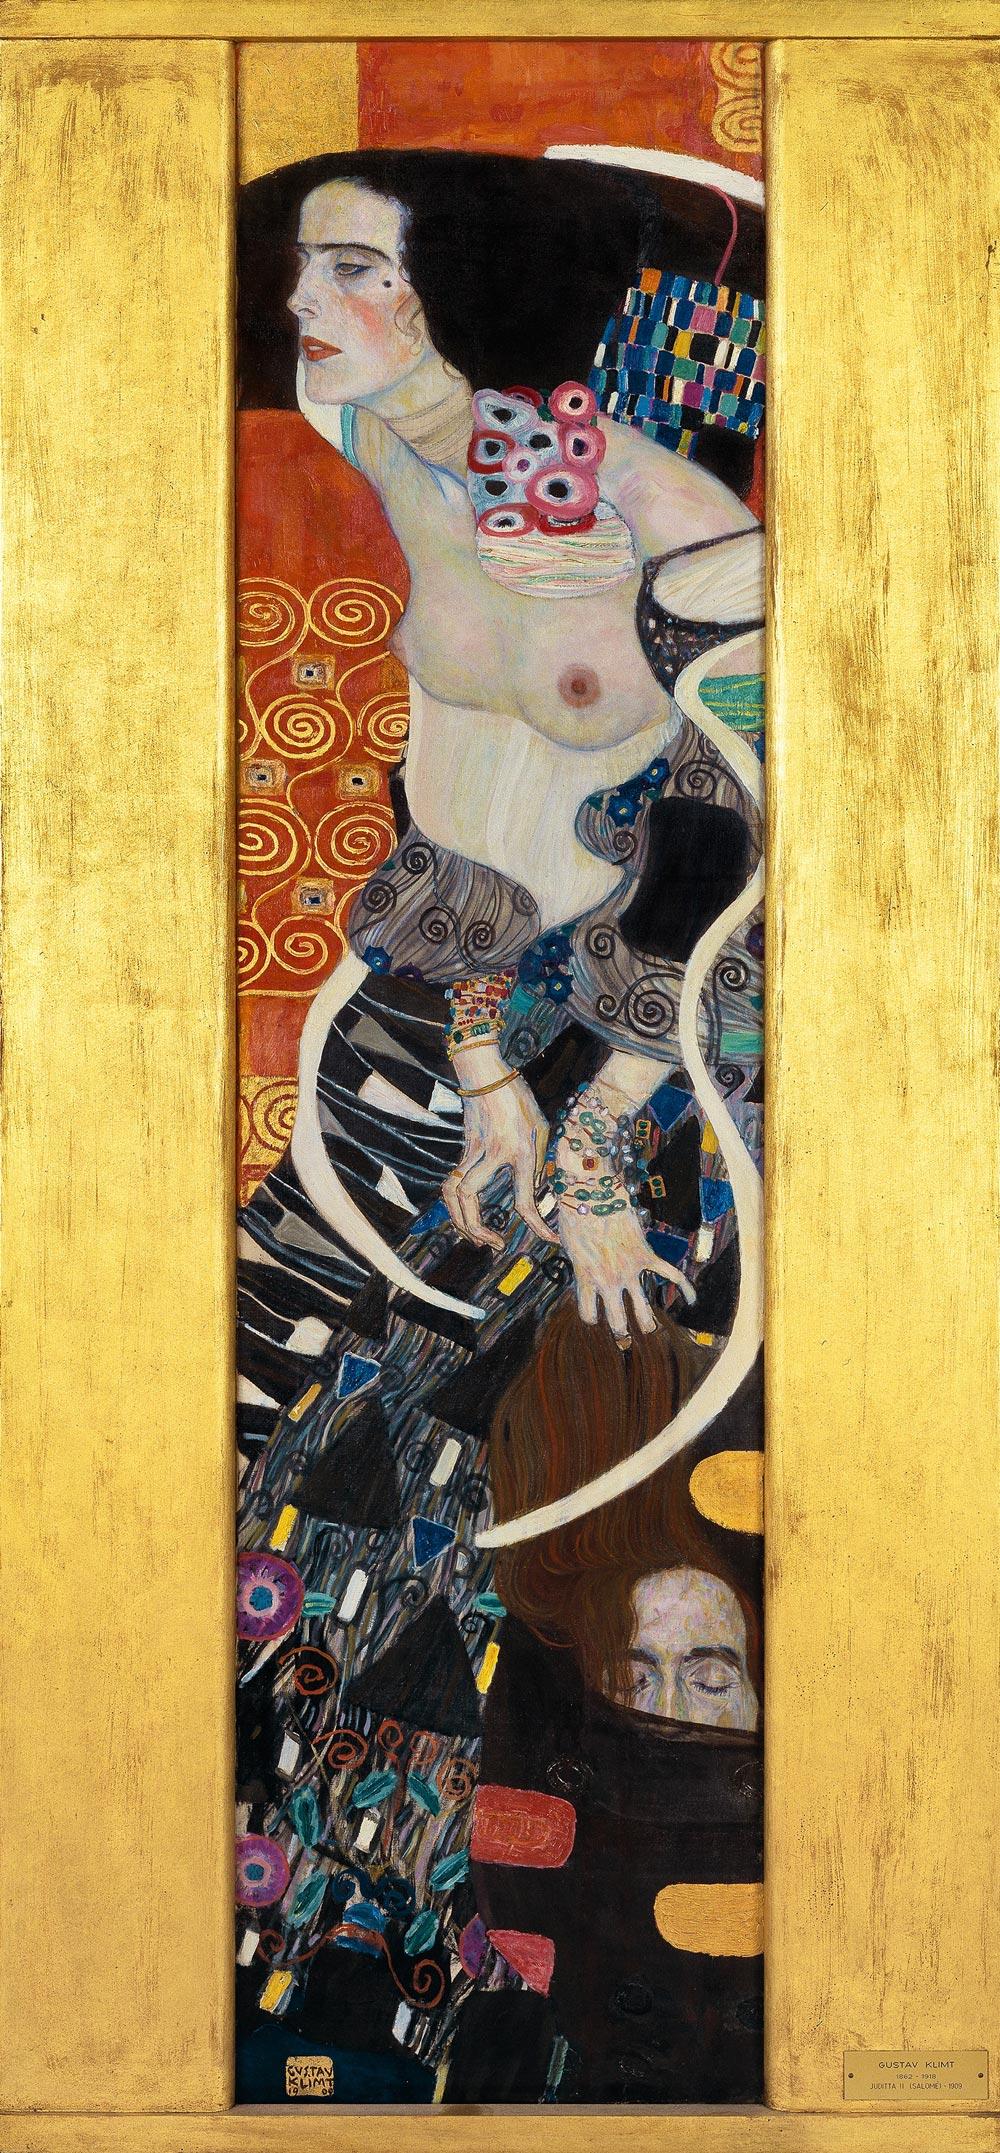 Gustav Klimt, Giuditta II (1909; olio su tela, 178 x 46 cm; Venezia, Galleria Internazionale d'Arte Moderna di Ca' Pesaro)